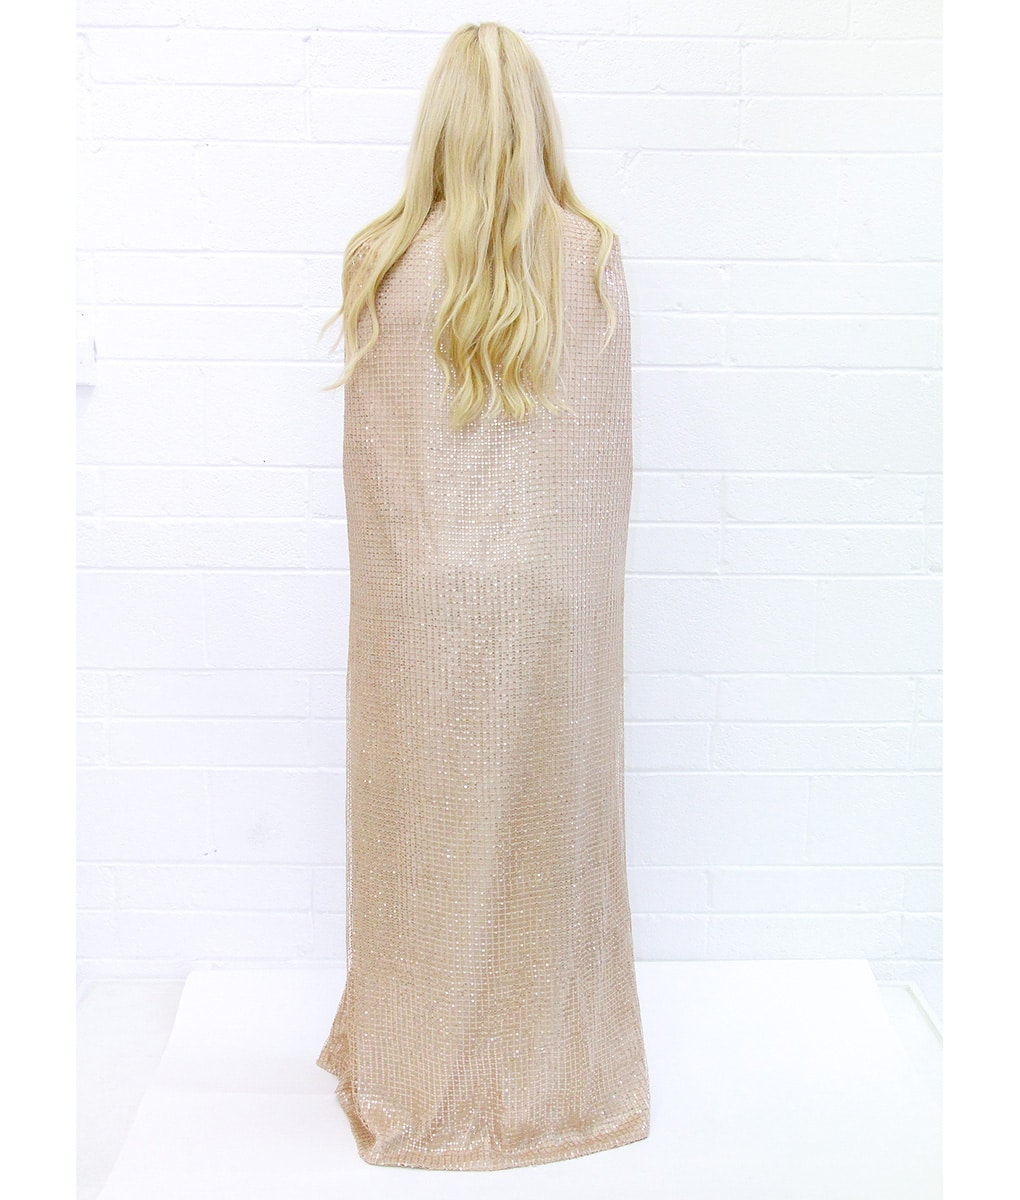 Alila-Champagne-Sequin-Cape-Gown-back-bariano